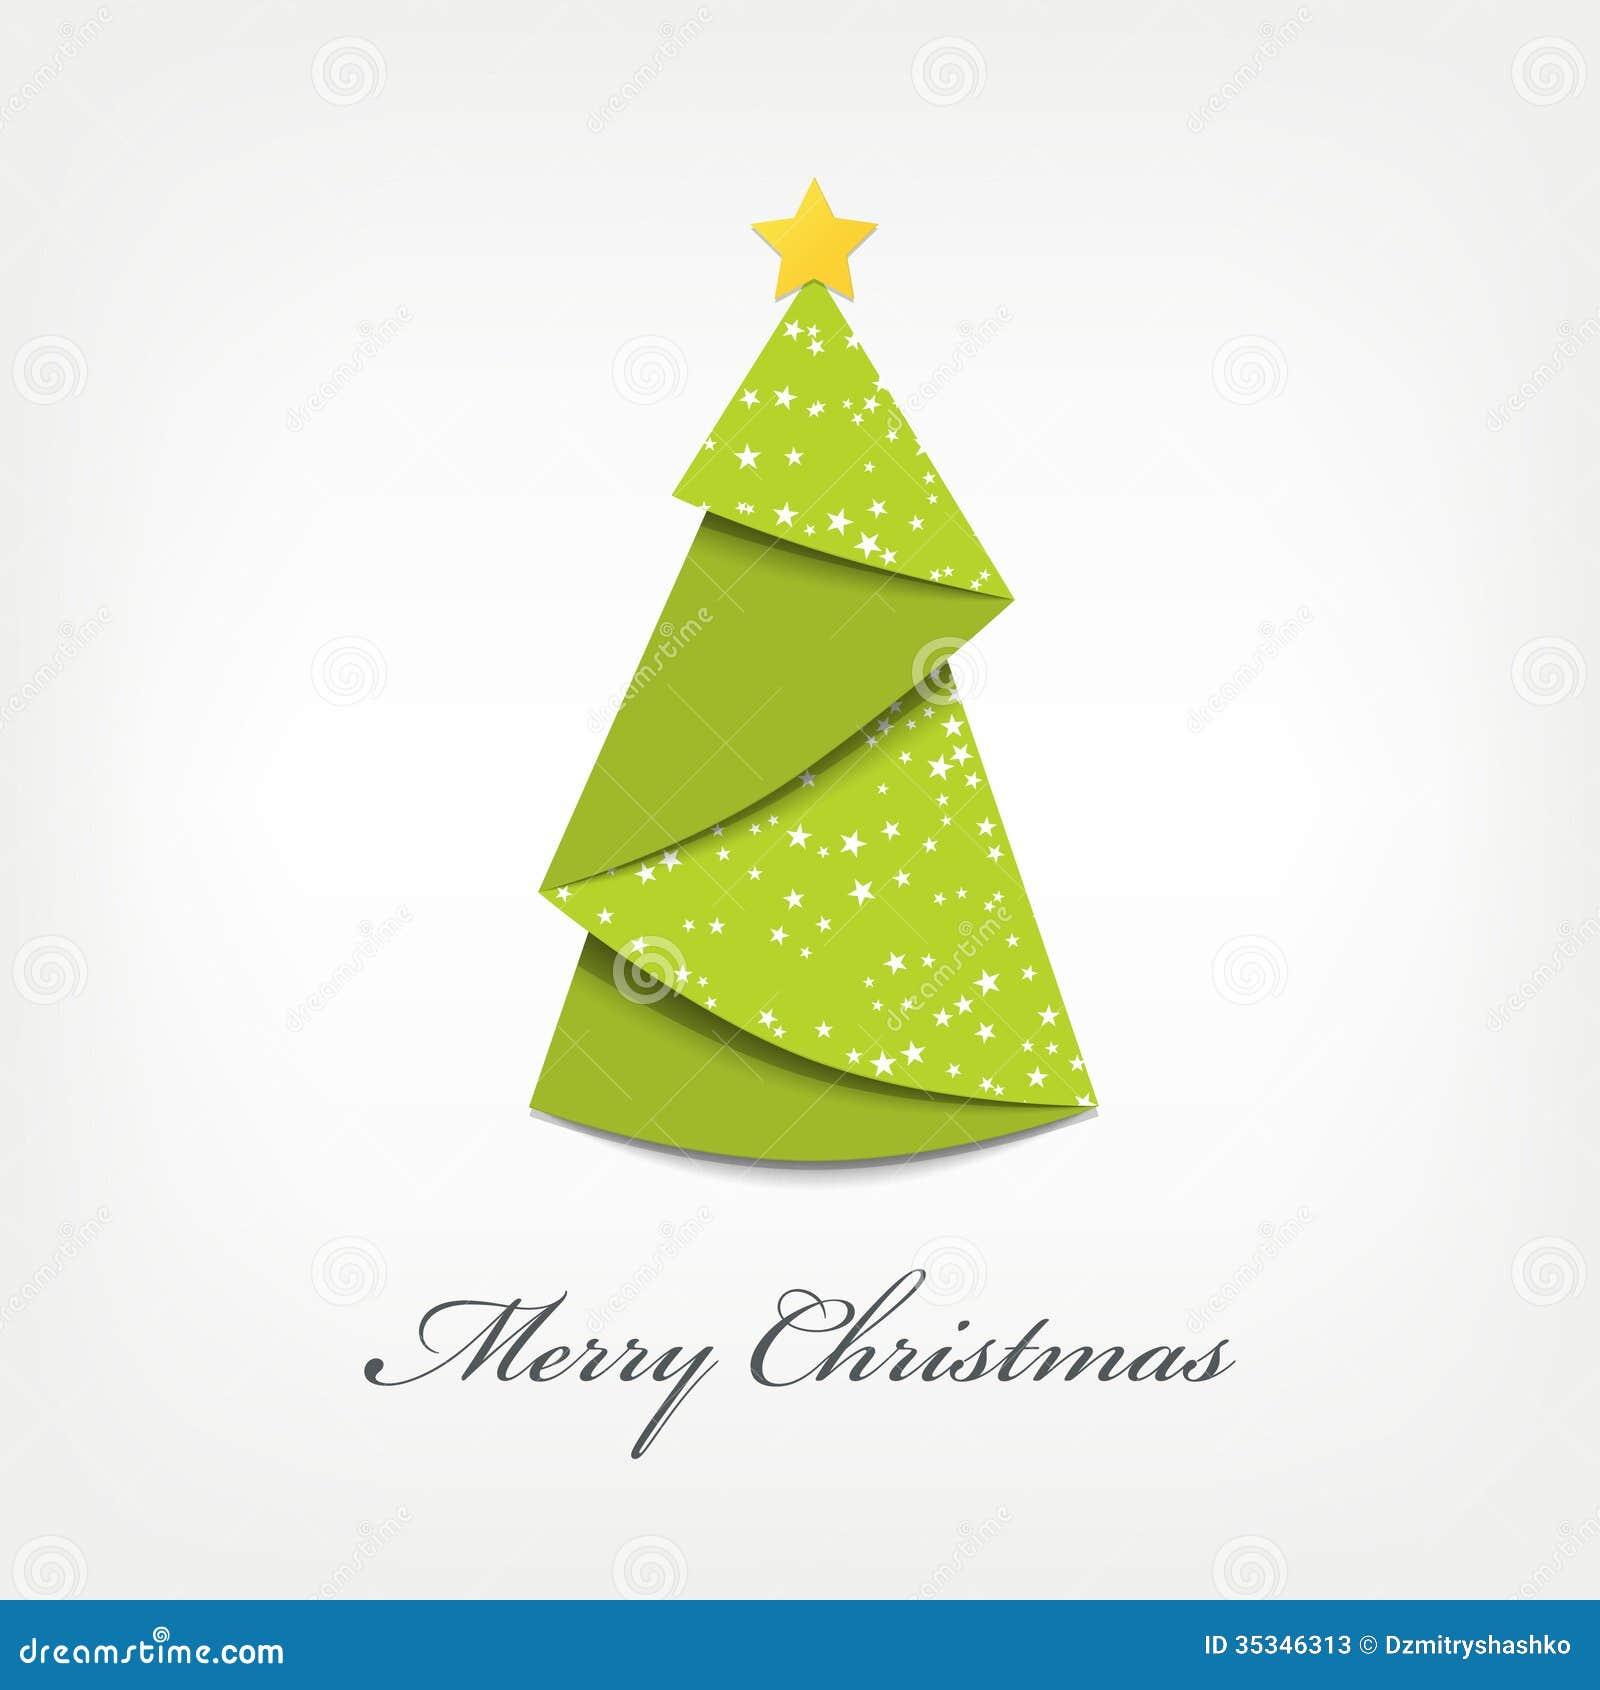 Christmas tree origami stock vector. Illustration of ... - photo#44